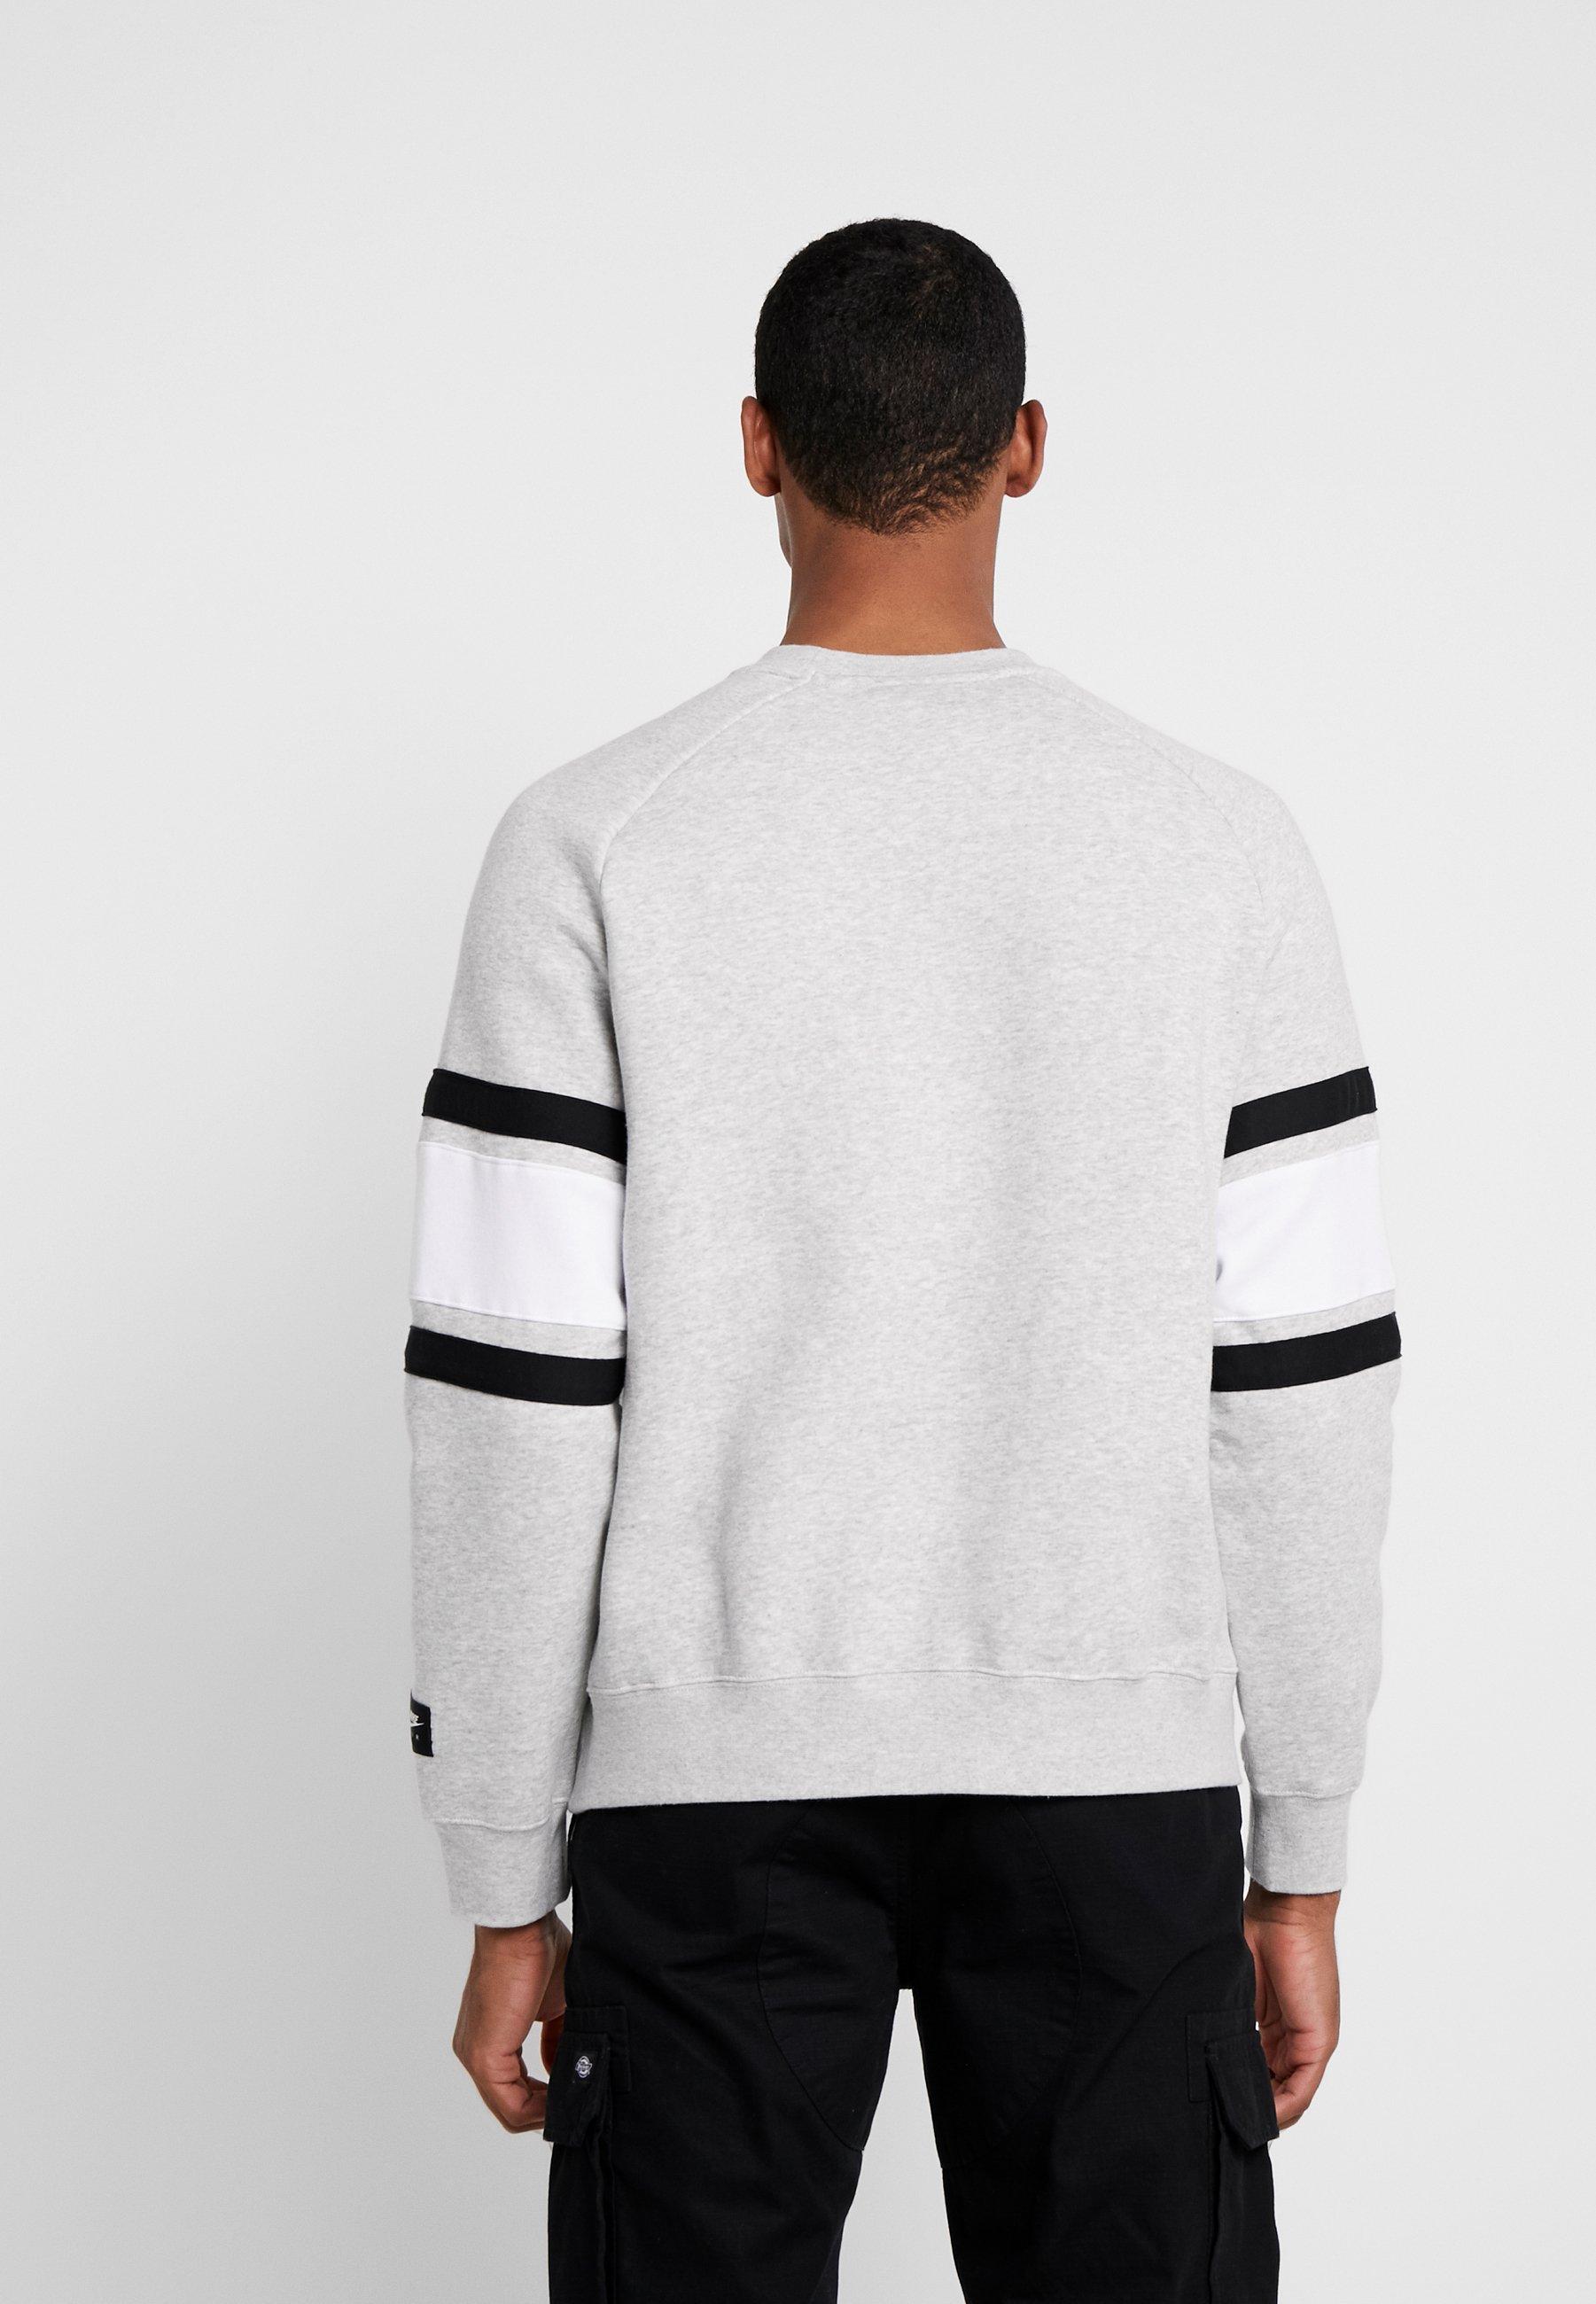 Nike Grey black Sportswear CrewSweatshirt Heather Air white ikOuPZTX